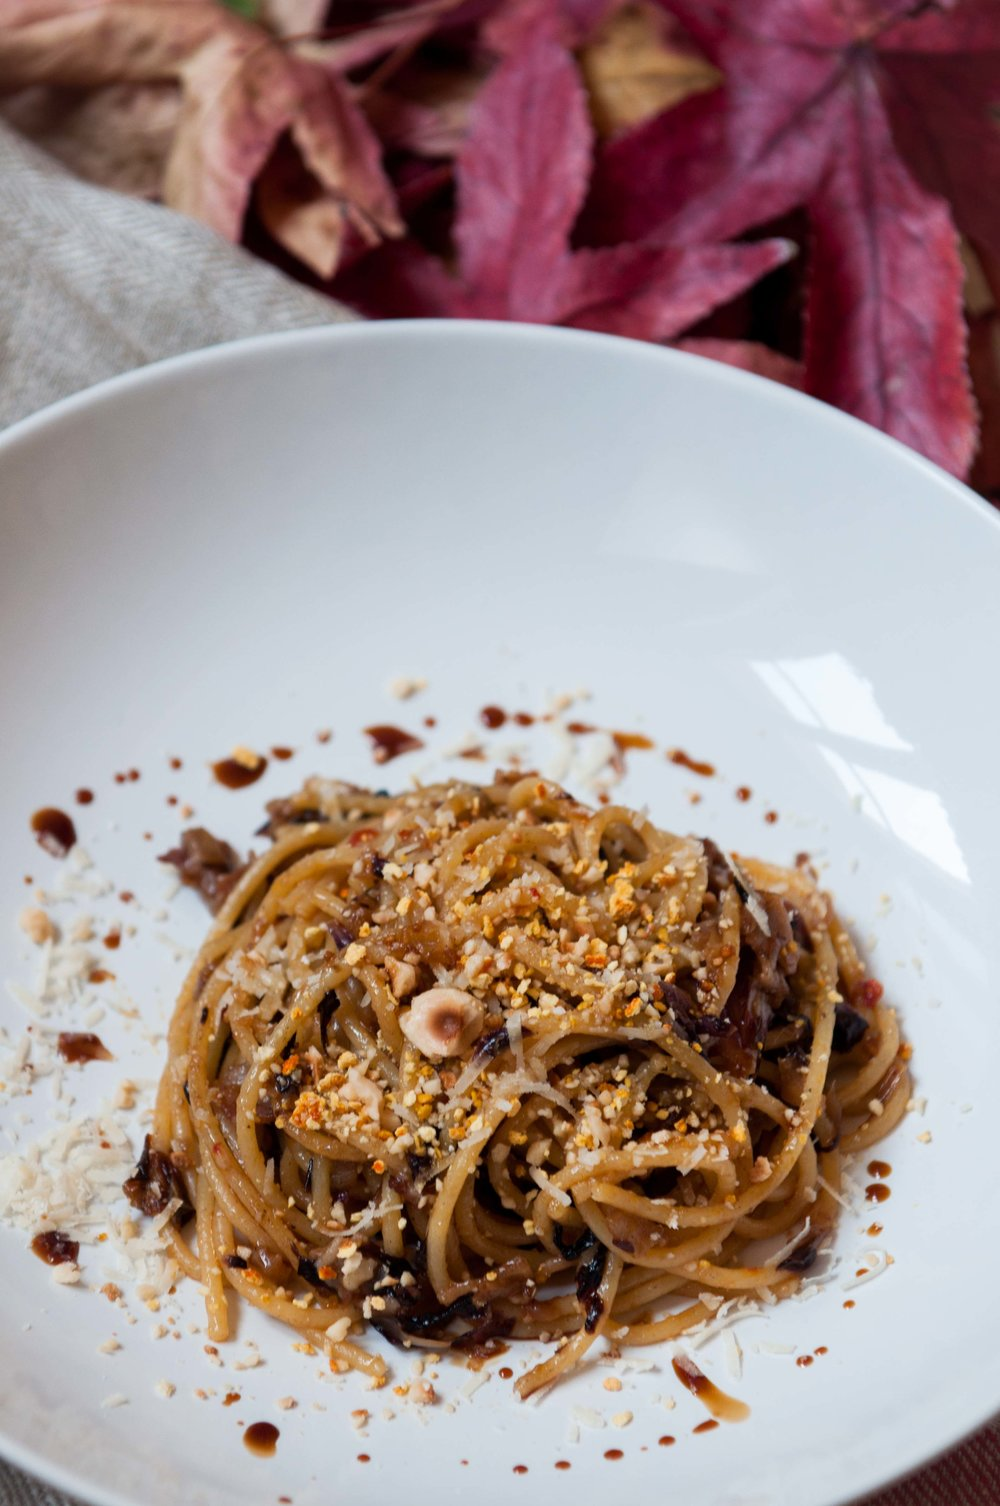 Braised Radicchio spaghetti + balsamic vinegar